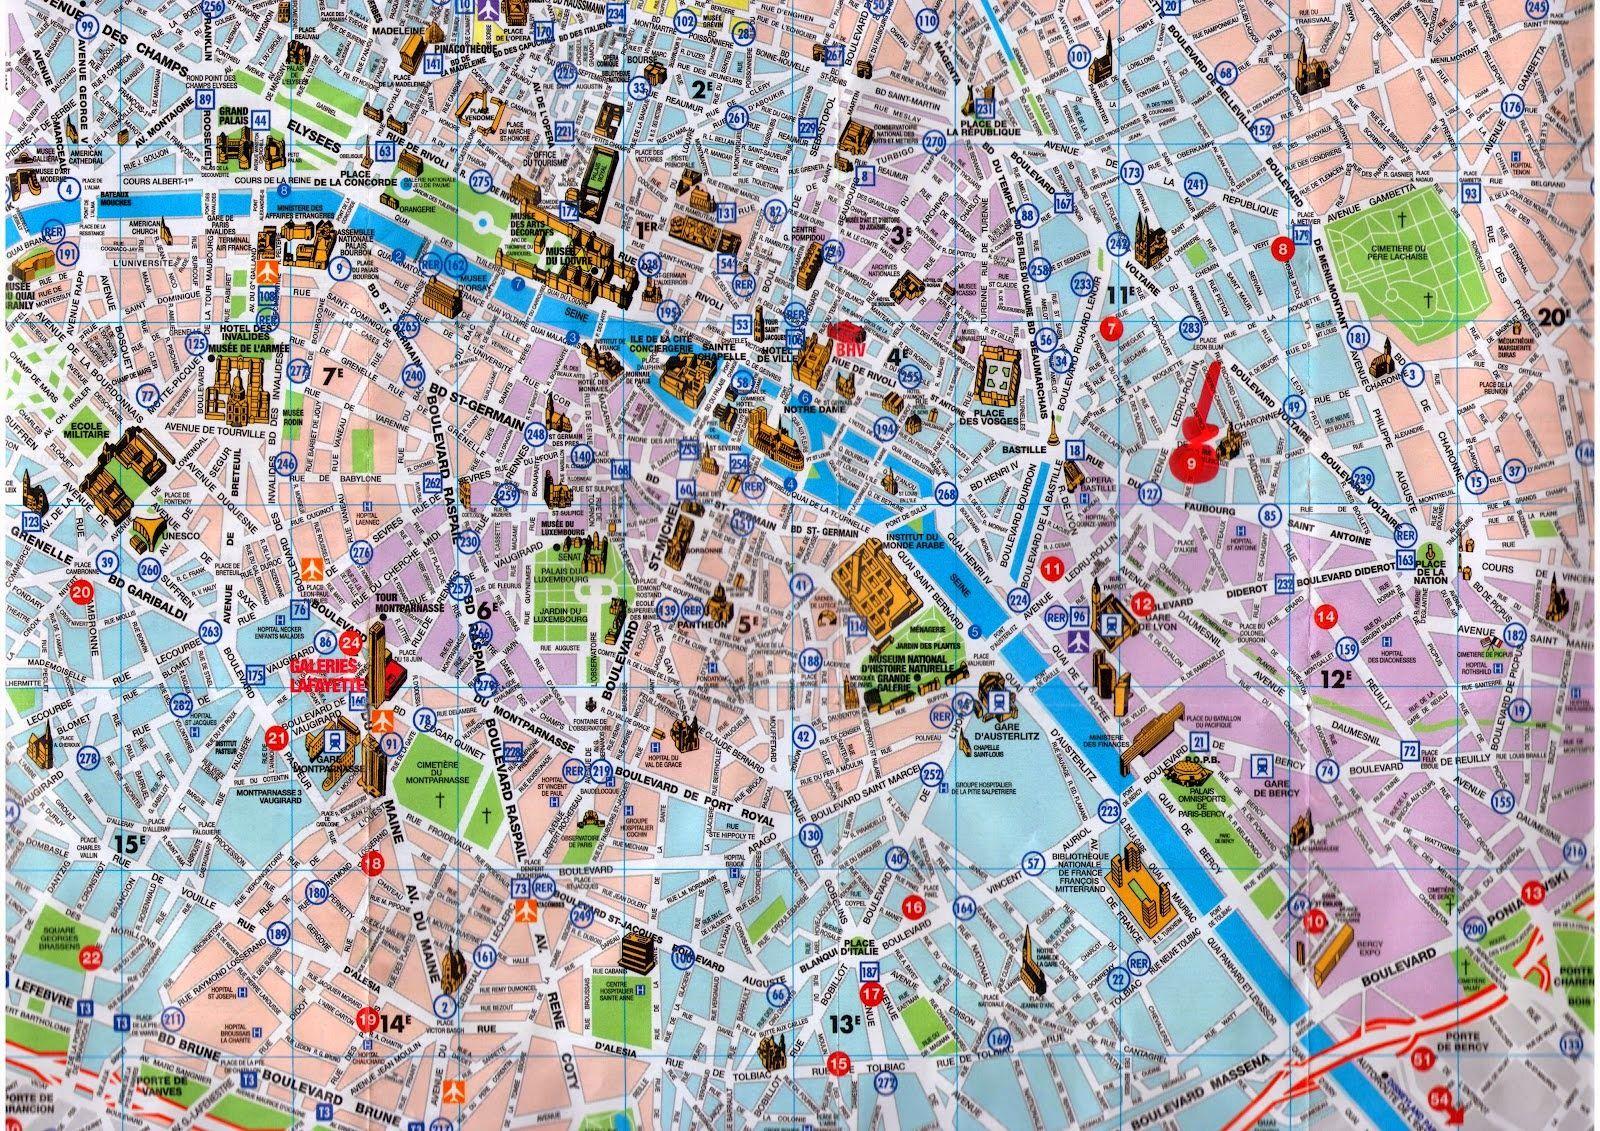 Paris Tarihi Harita   My Style My House - Ev Dekorasyon Fikirleri Ve - Printable Map Of Paris City Centre